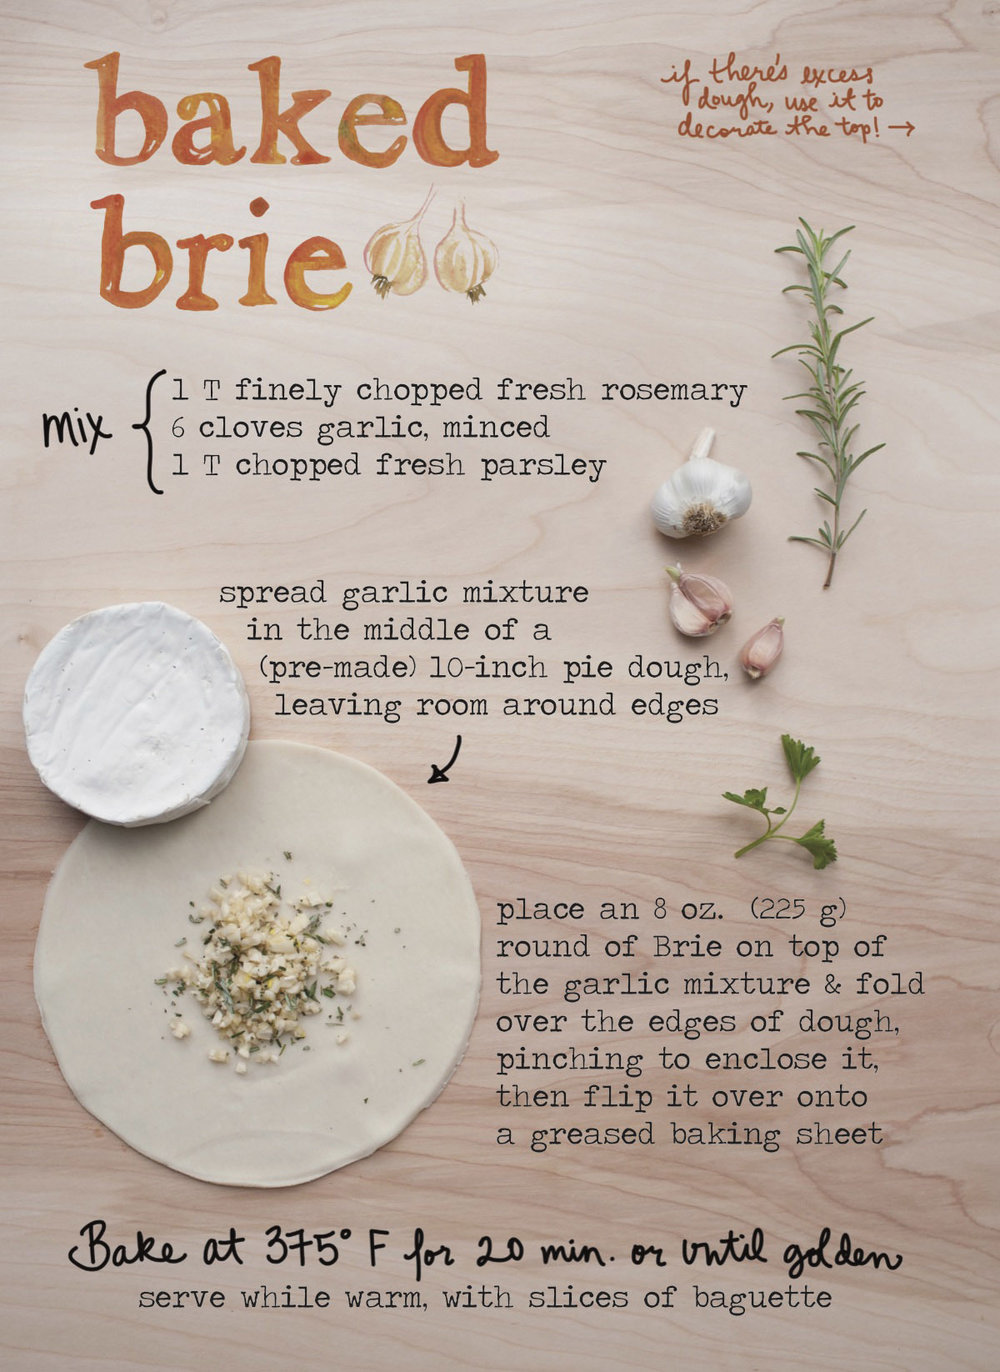 baked-brie2.JPG